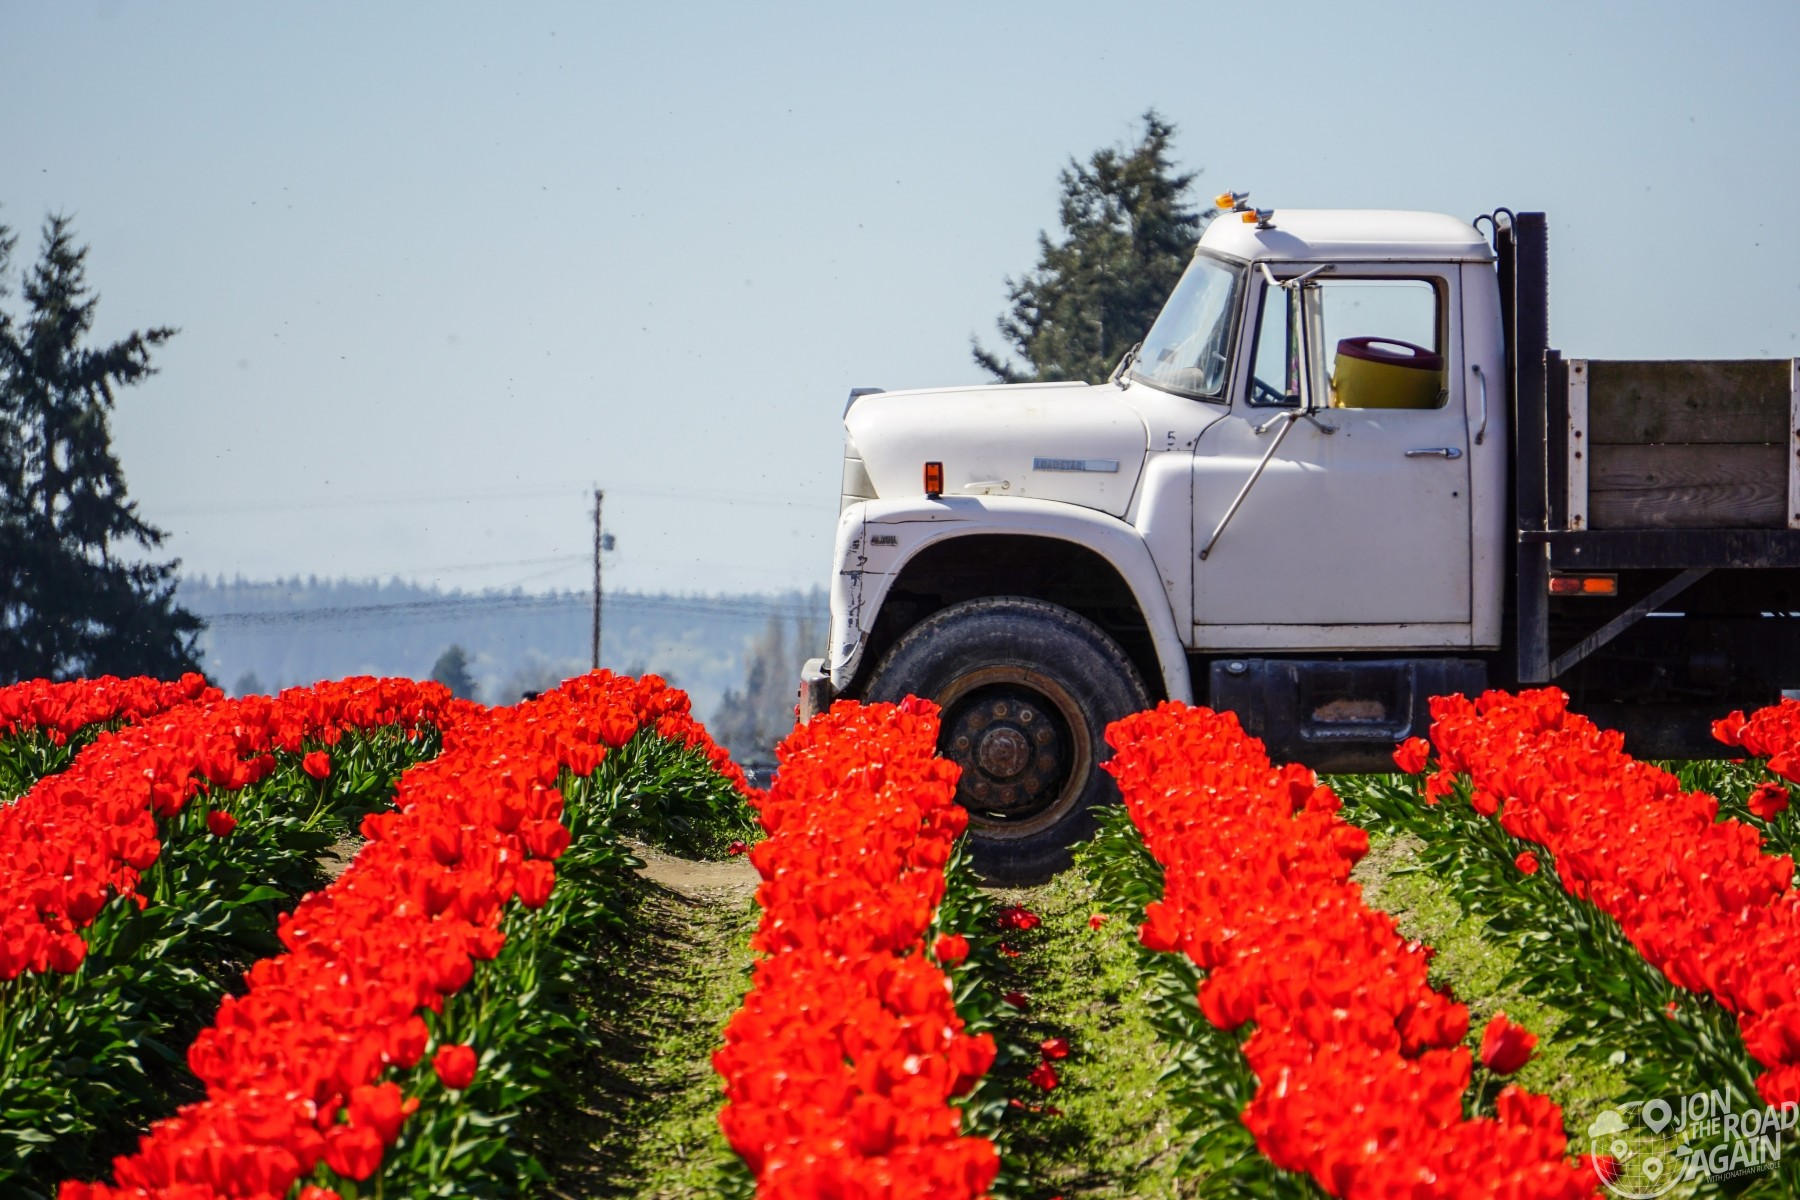 Tulip truck at Roozengaarde